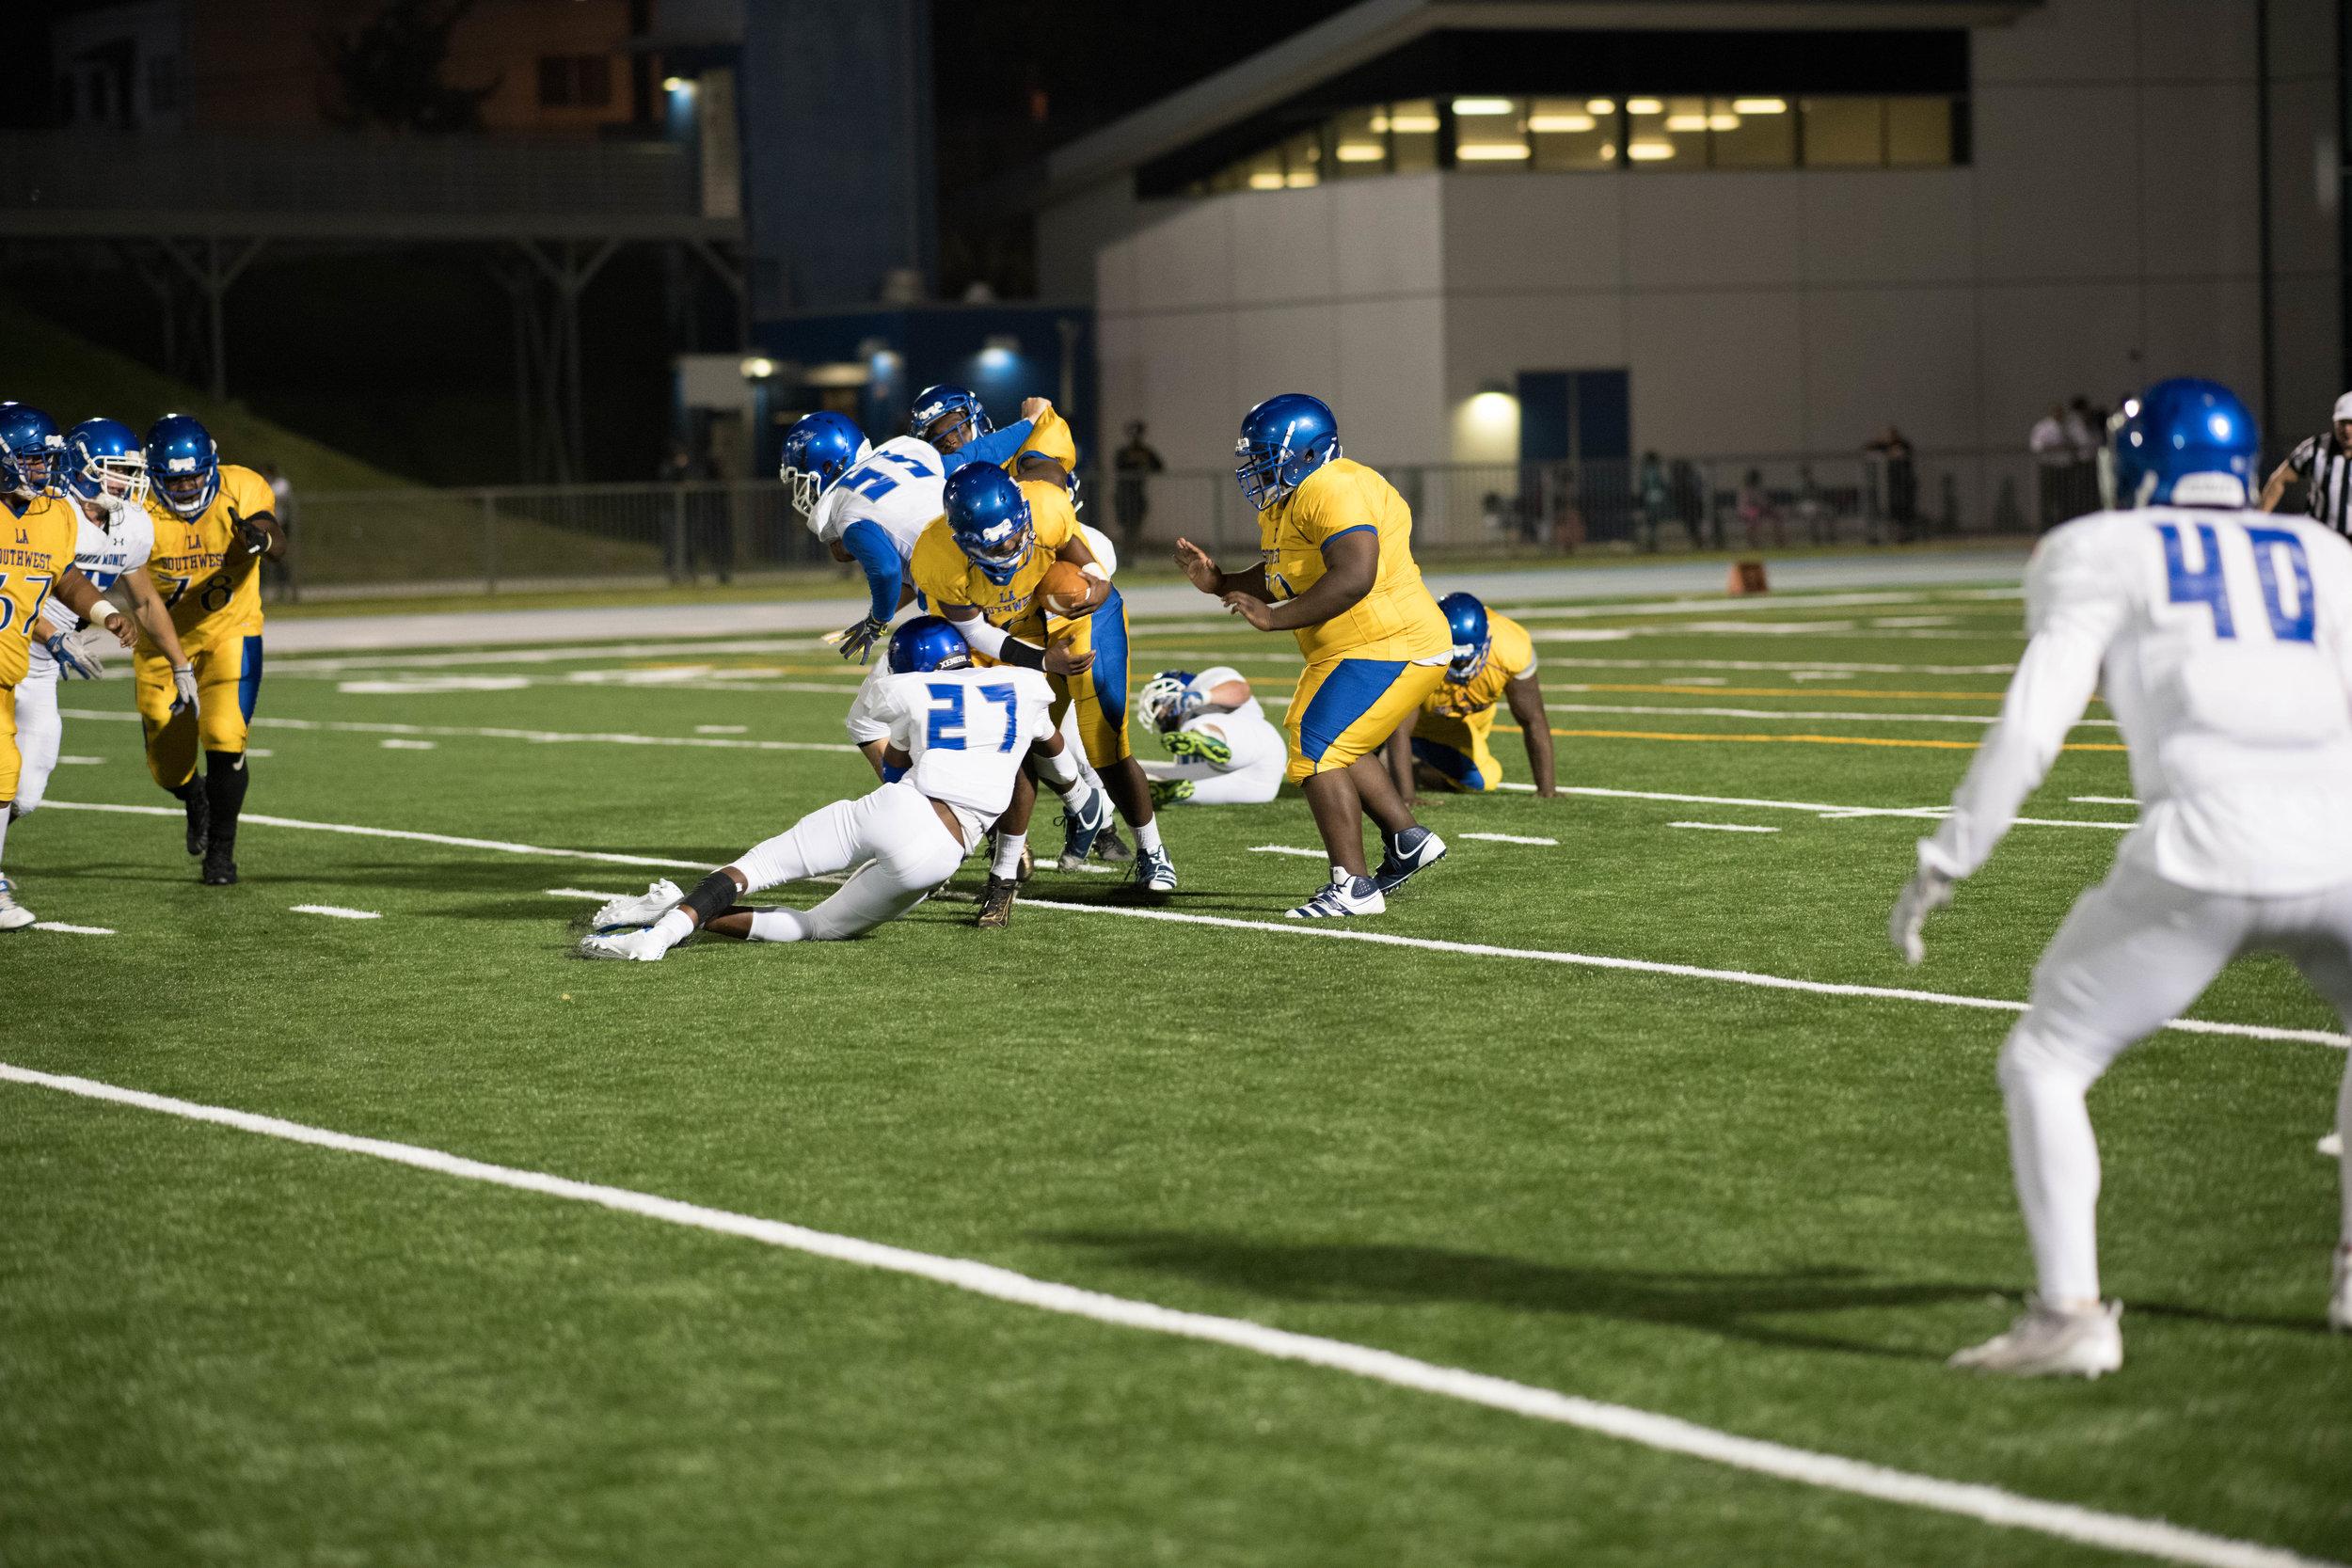 #27 Kason Robertson sacks Southwest quarterback.(Photo by Kevin Tidmore/The Corsair)